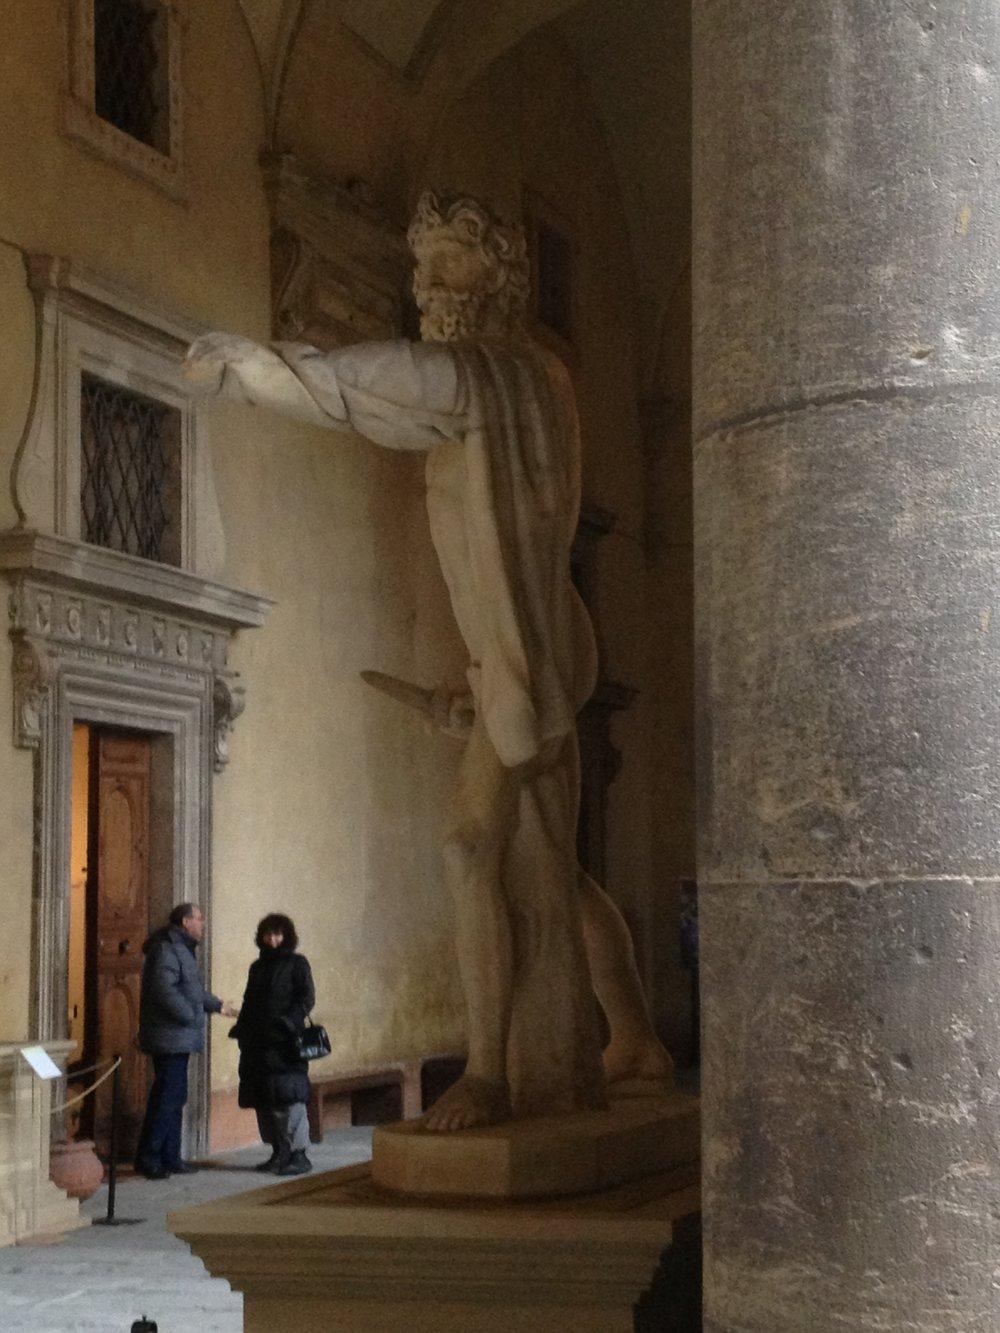 Pseudoithyphallic-iconography-statues-jessewaugh.com-4.jpg